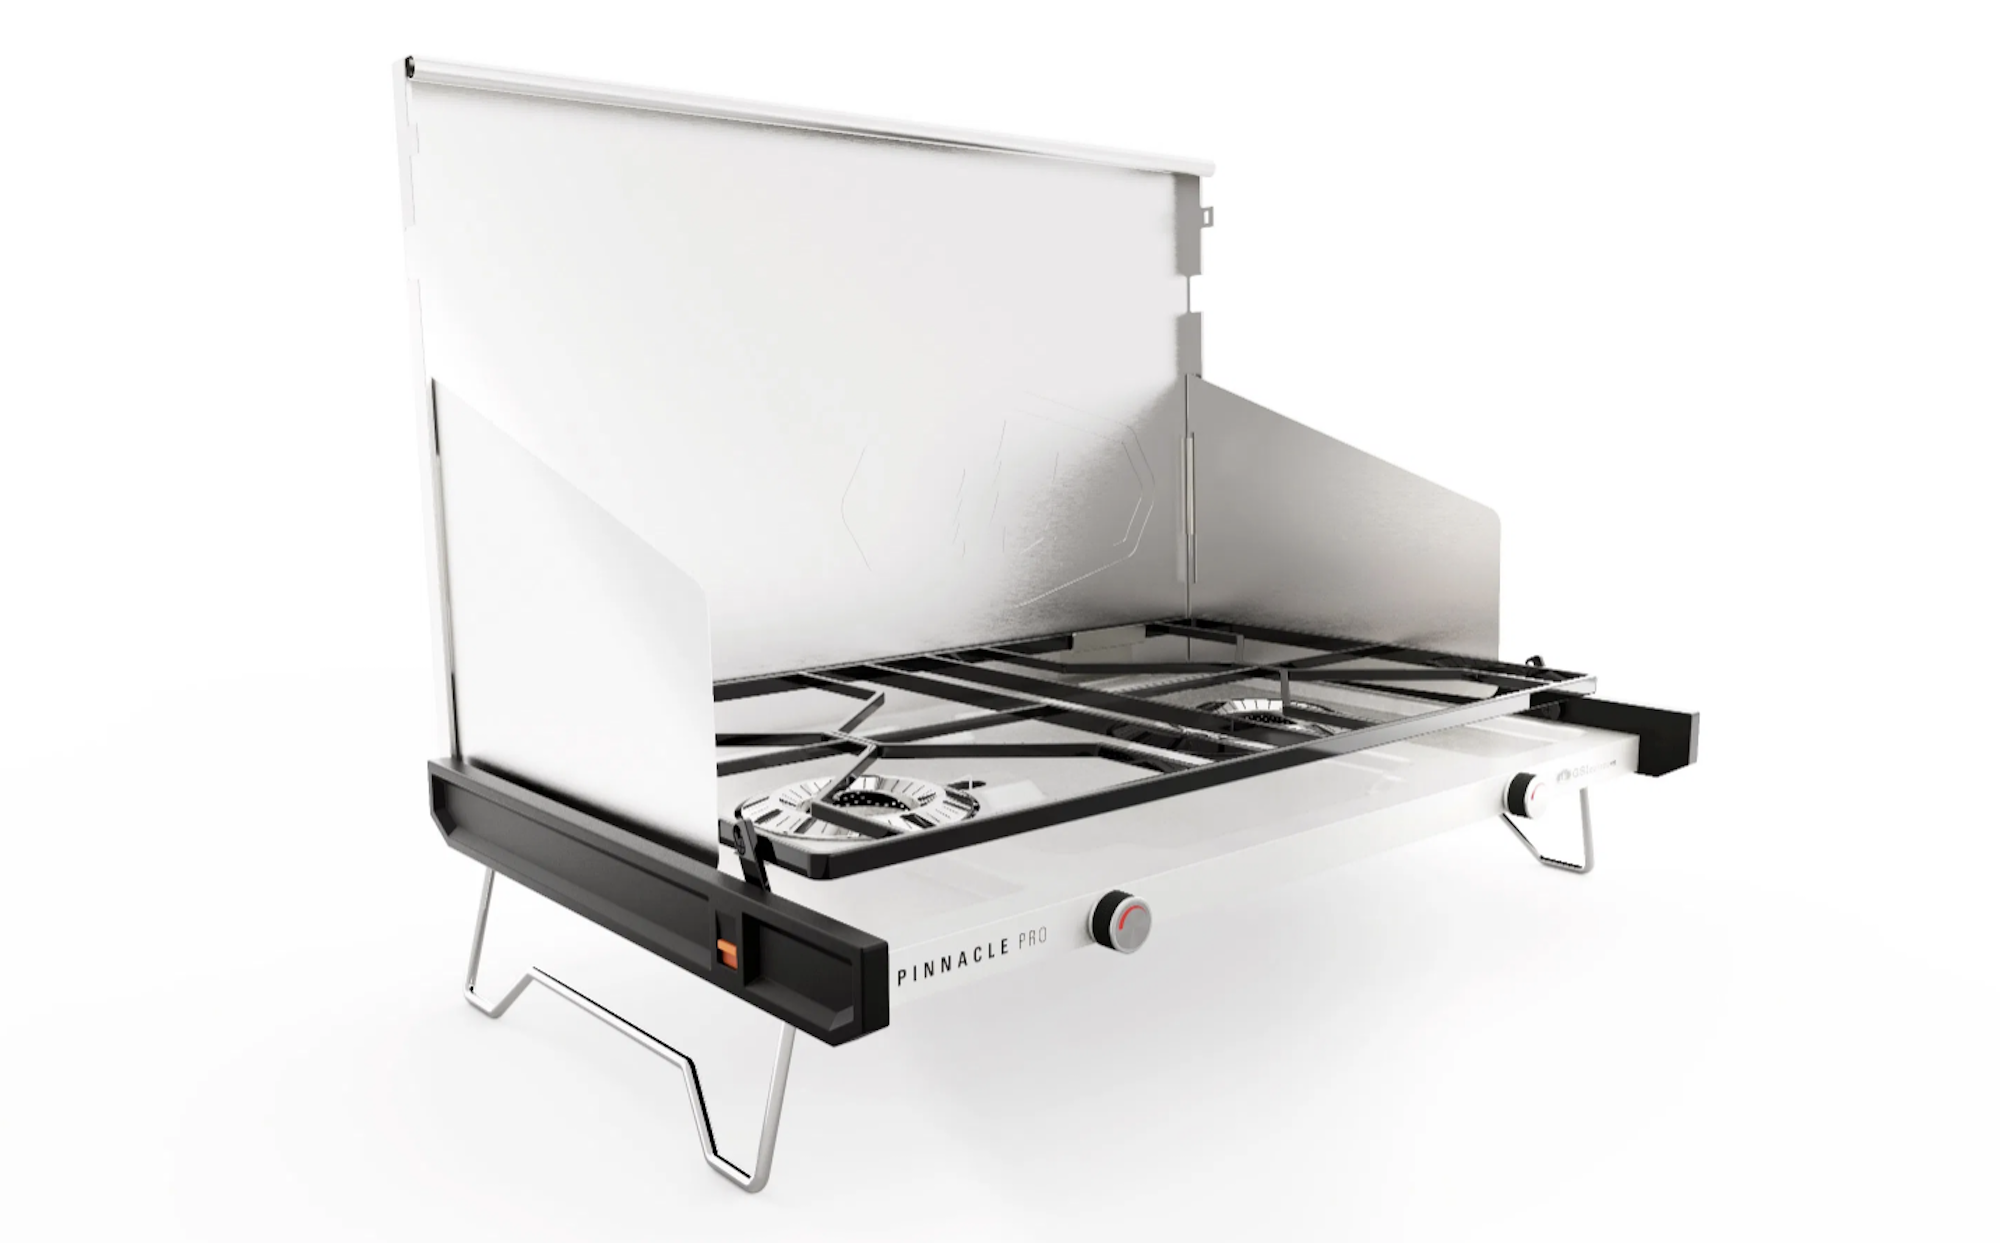 gsi new pinnacle stove